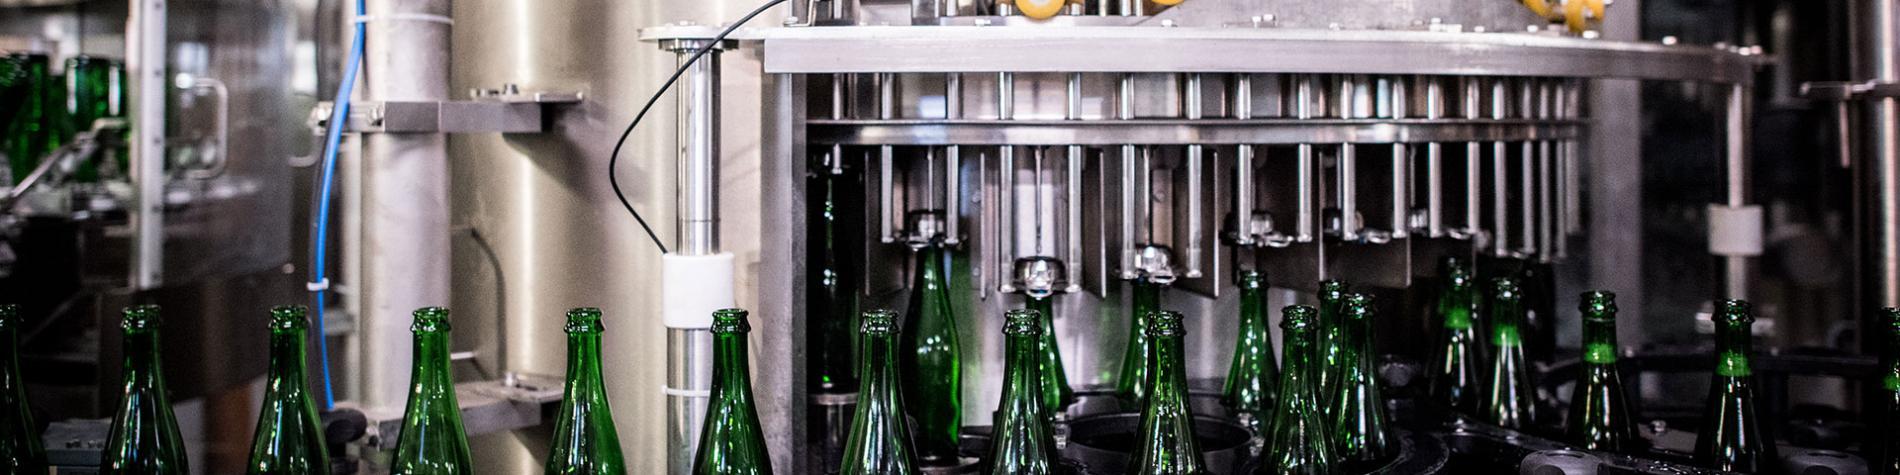 Brasserie - Dupont - Tourpes - Hainaut - bières bio - miel